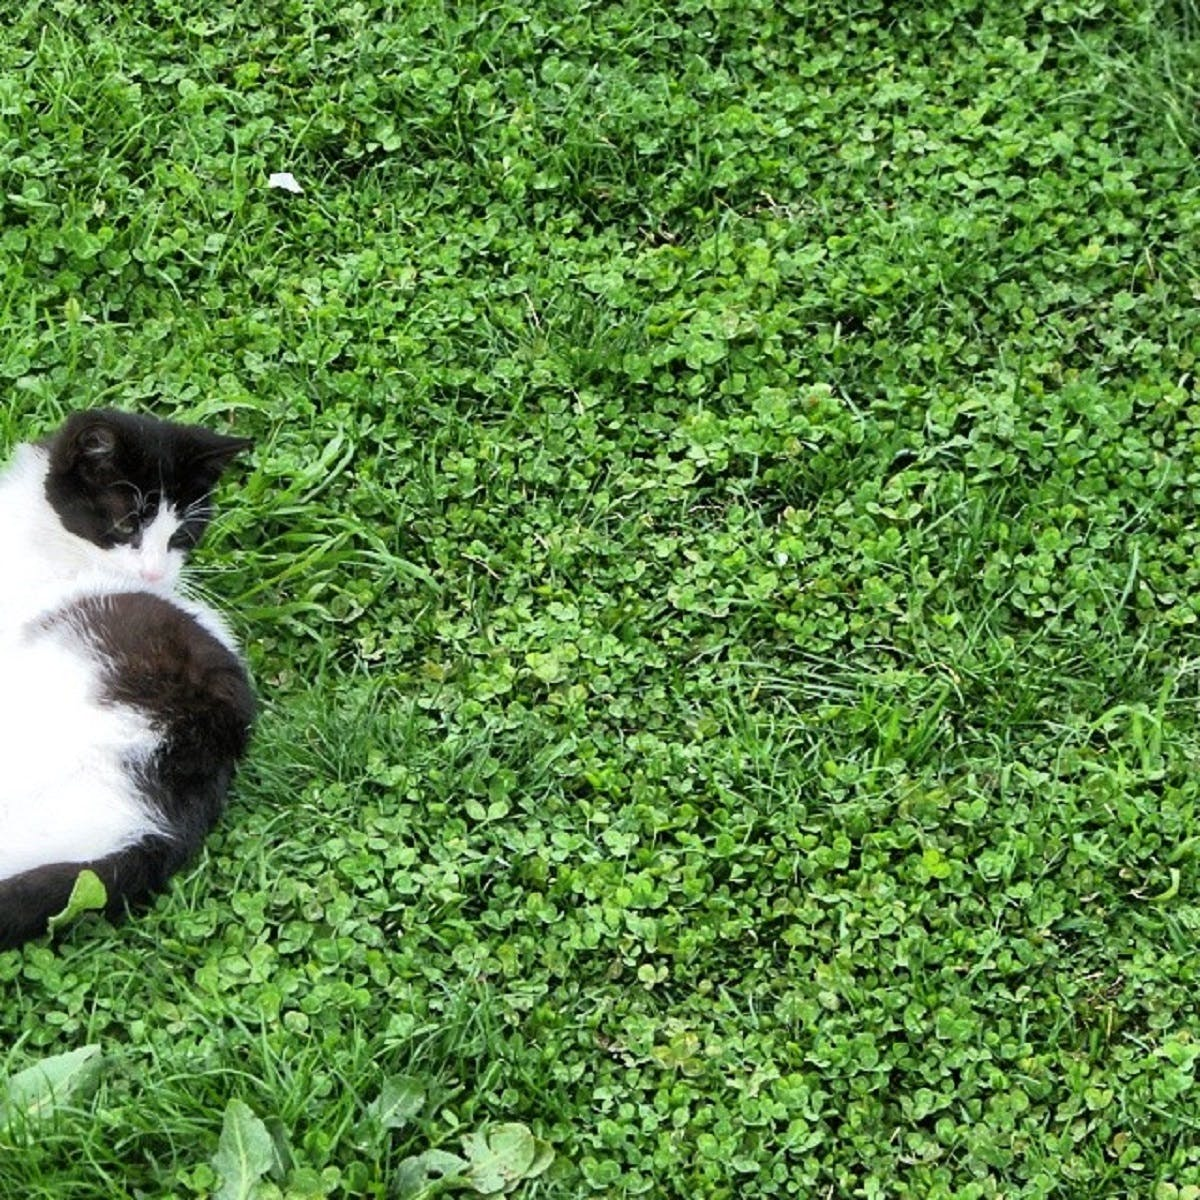 A black & white cat rolls around in the grasss